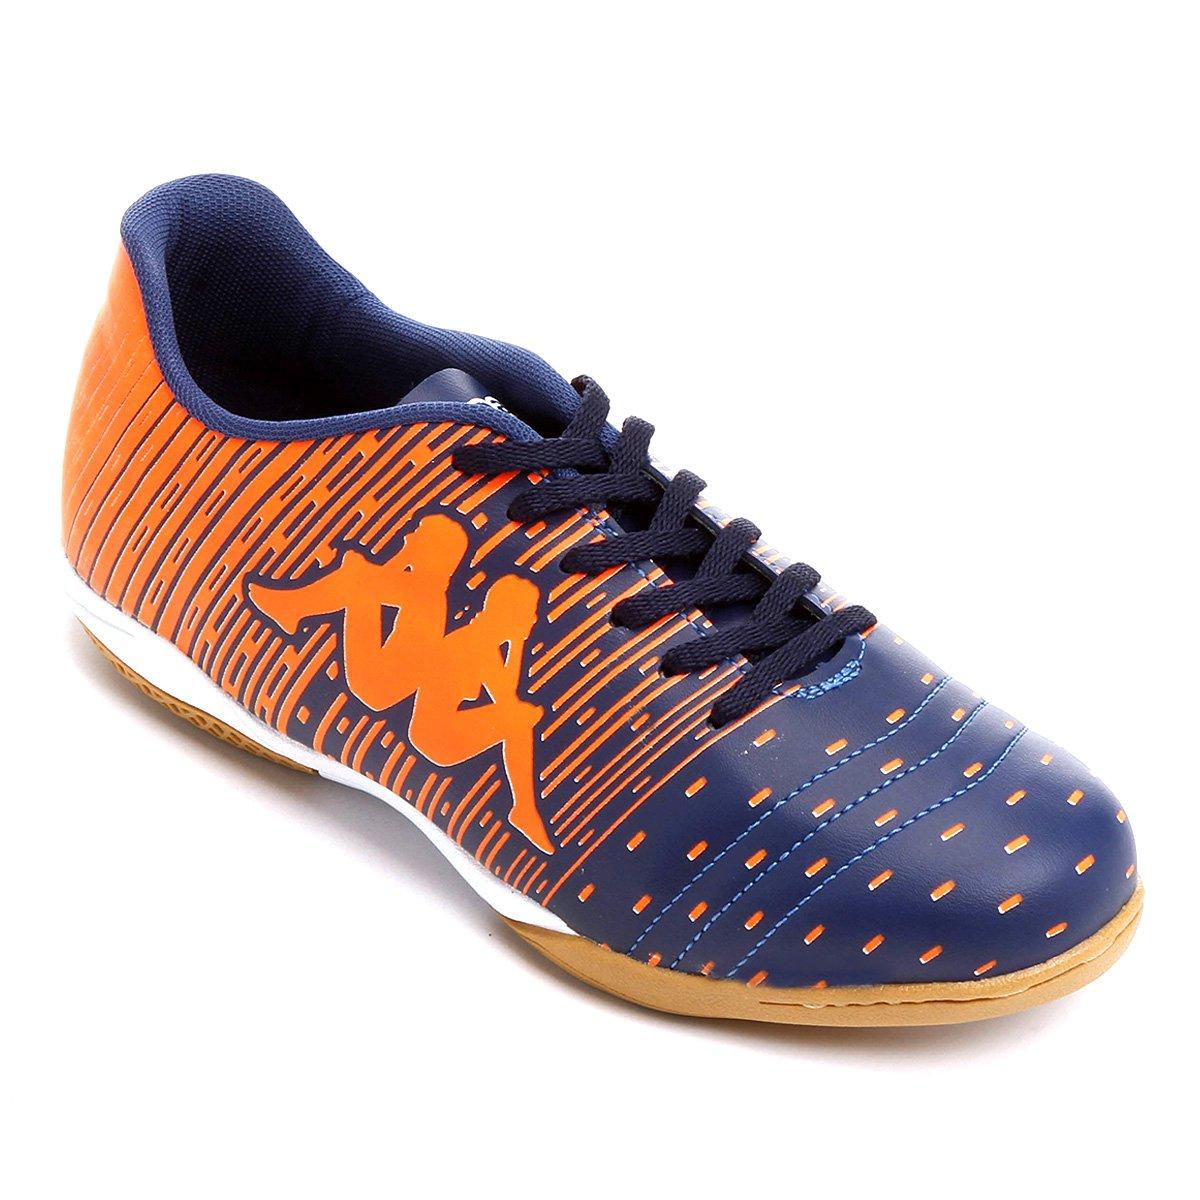 Chuteira Futsal Kappa Adige - Compre Agora  9529e86c731d4